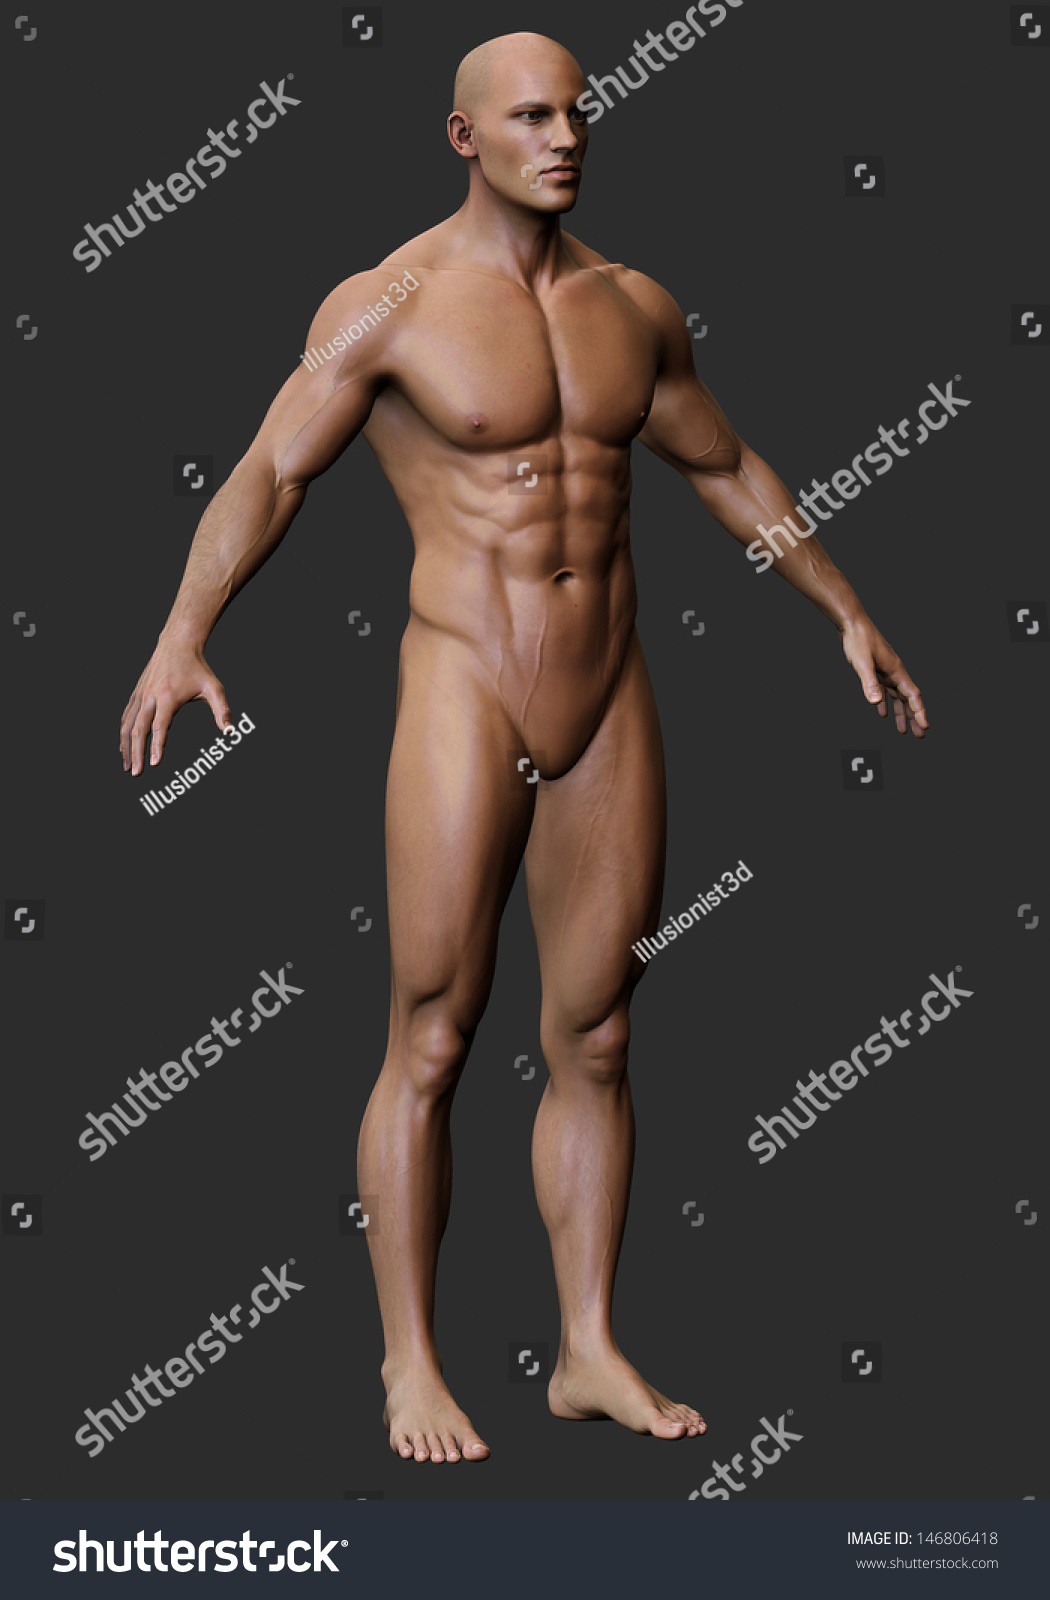 3d male body anatomy naked stock illustration 146806418 - shutterstock